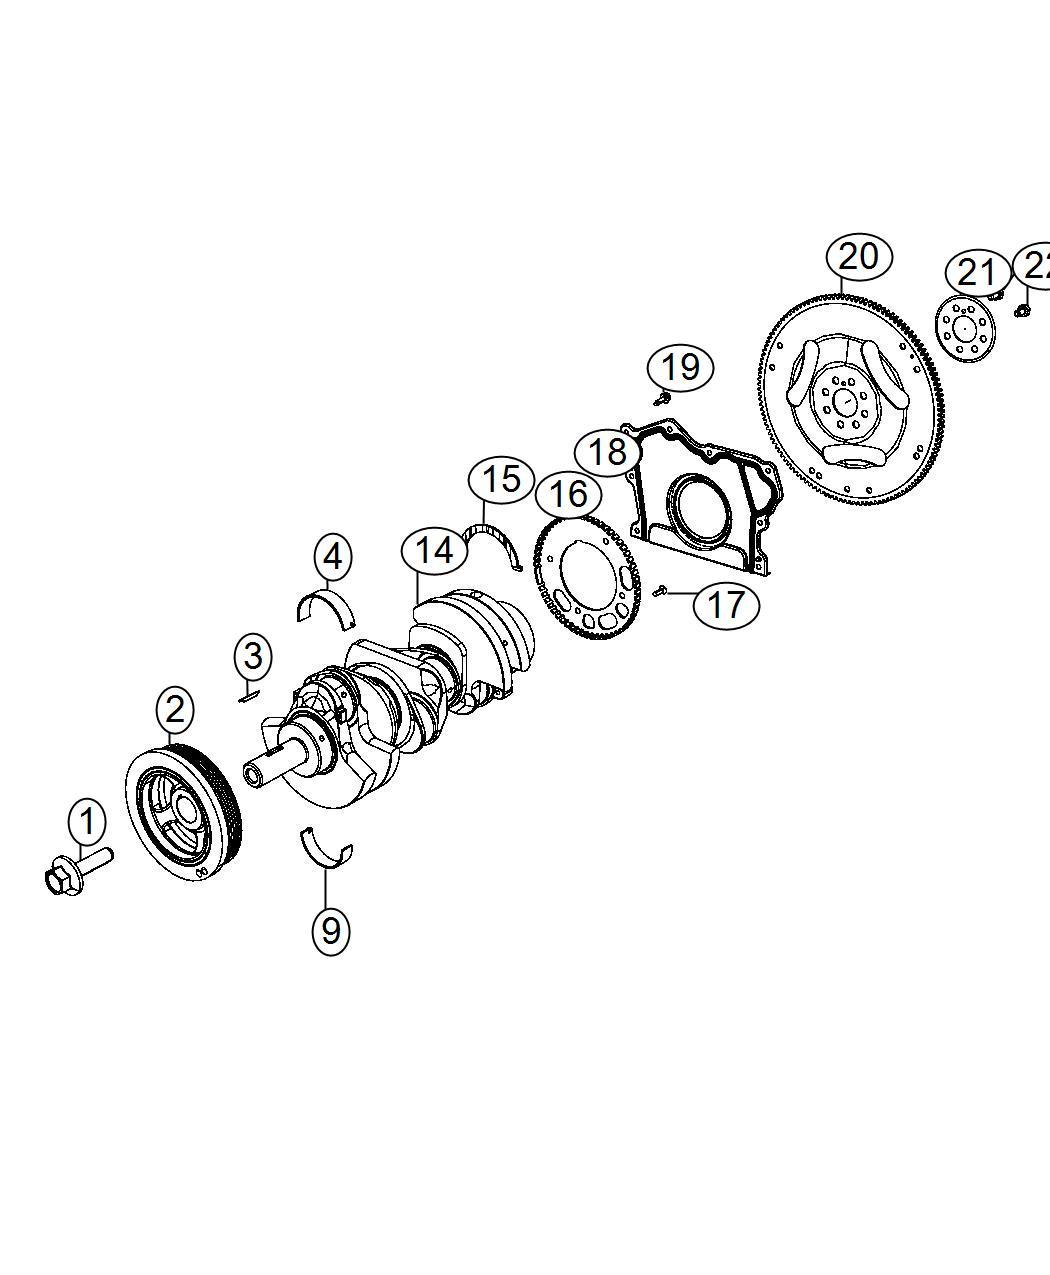 Chrysler 300 Damper. Crankshaft. Flywheel, engine